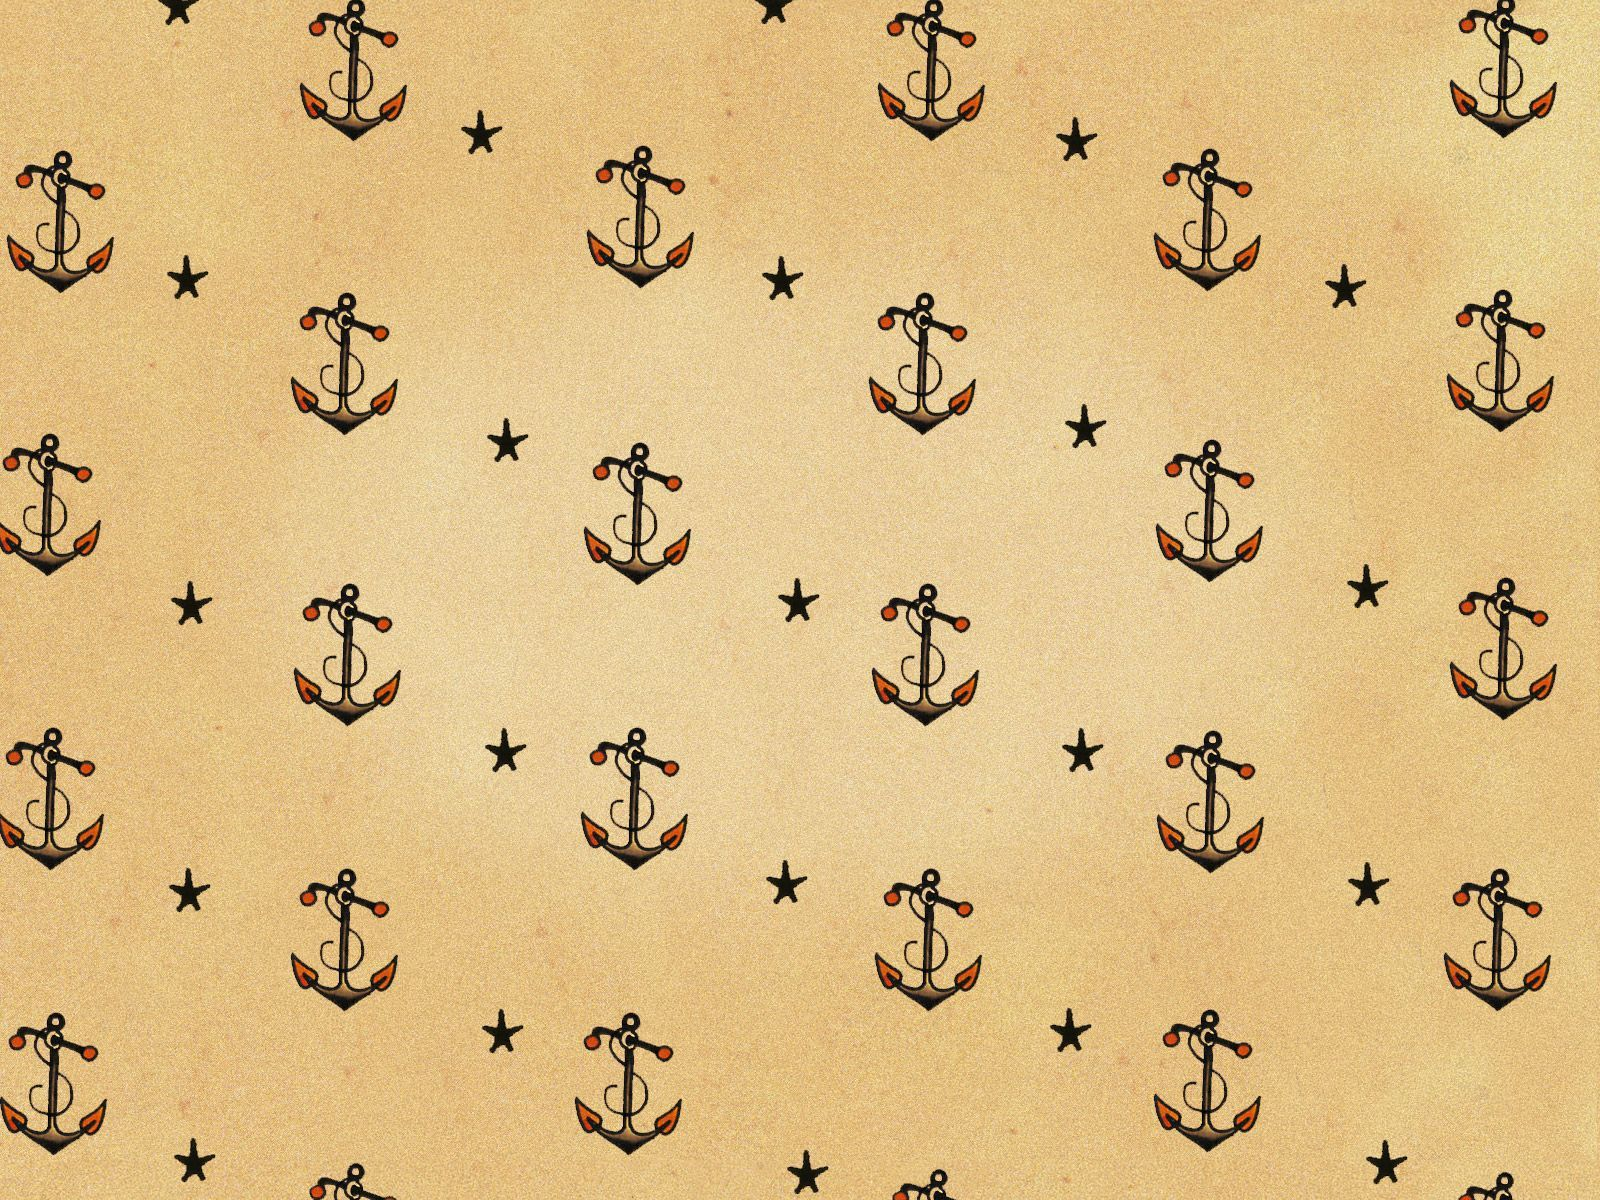 Sailor Jerry Wallpapers Top Free Sailor Jerry Backgrounds Wallpaperaccess